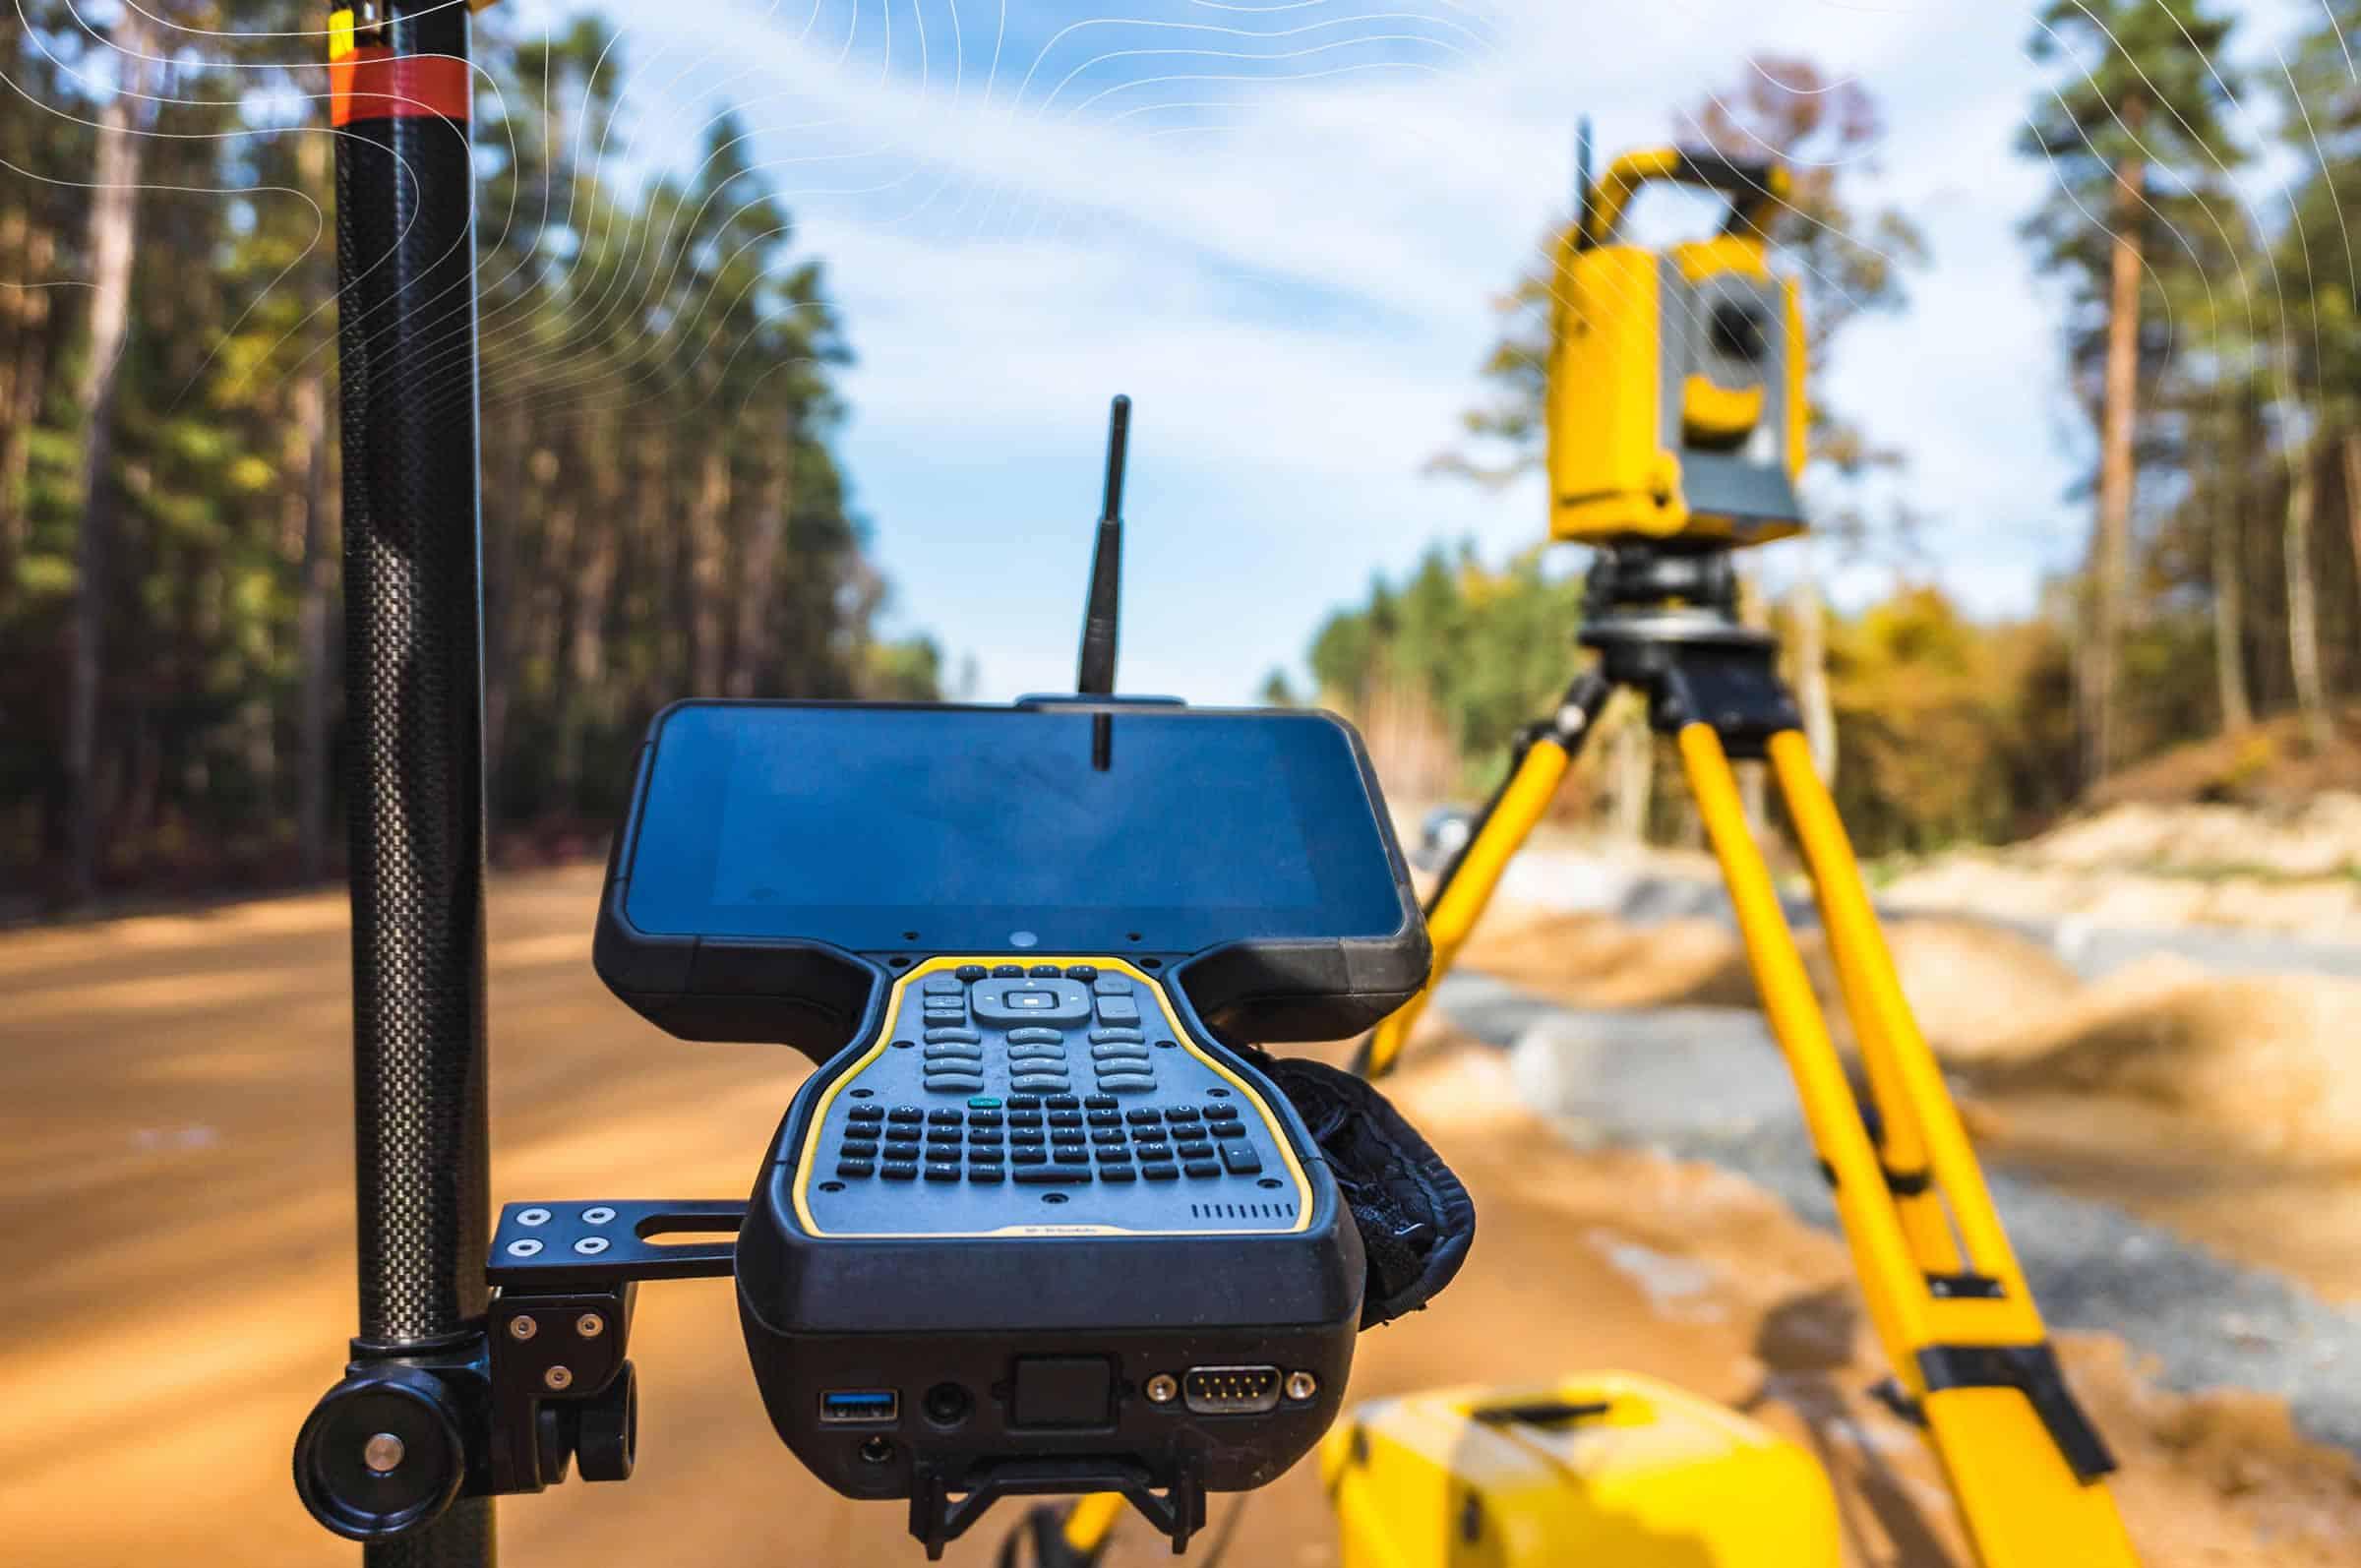 Surveyor, Geomatics and GIS company servicing Alberta and British Columbia